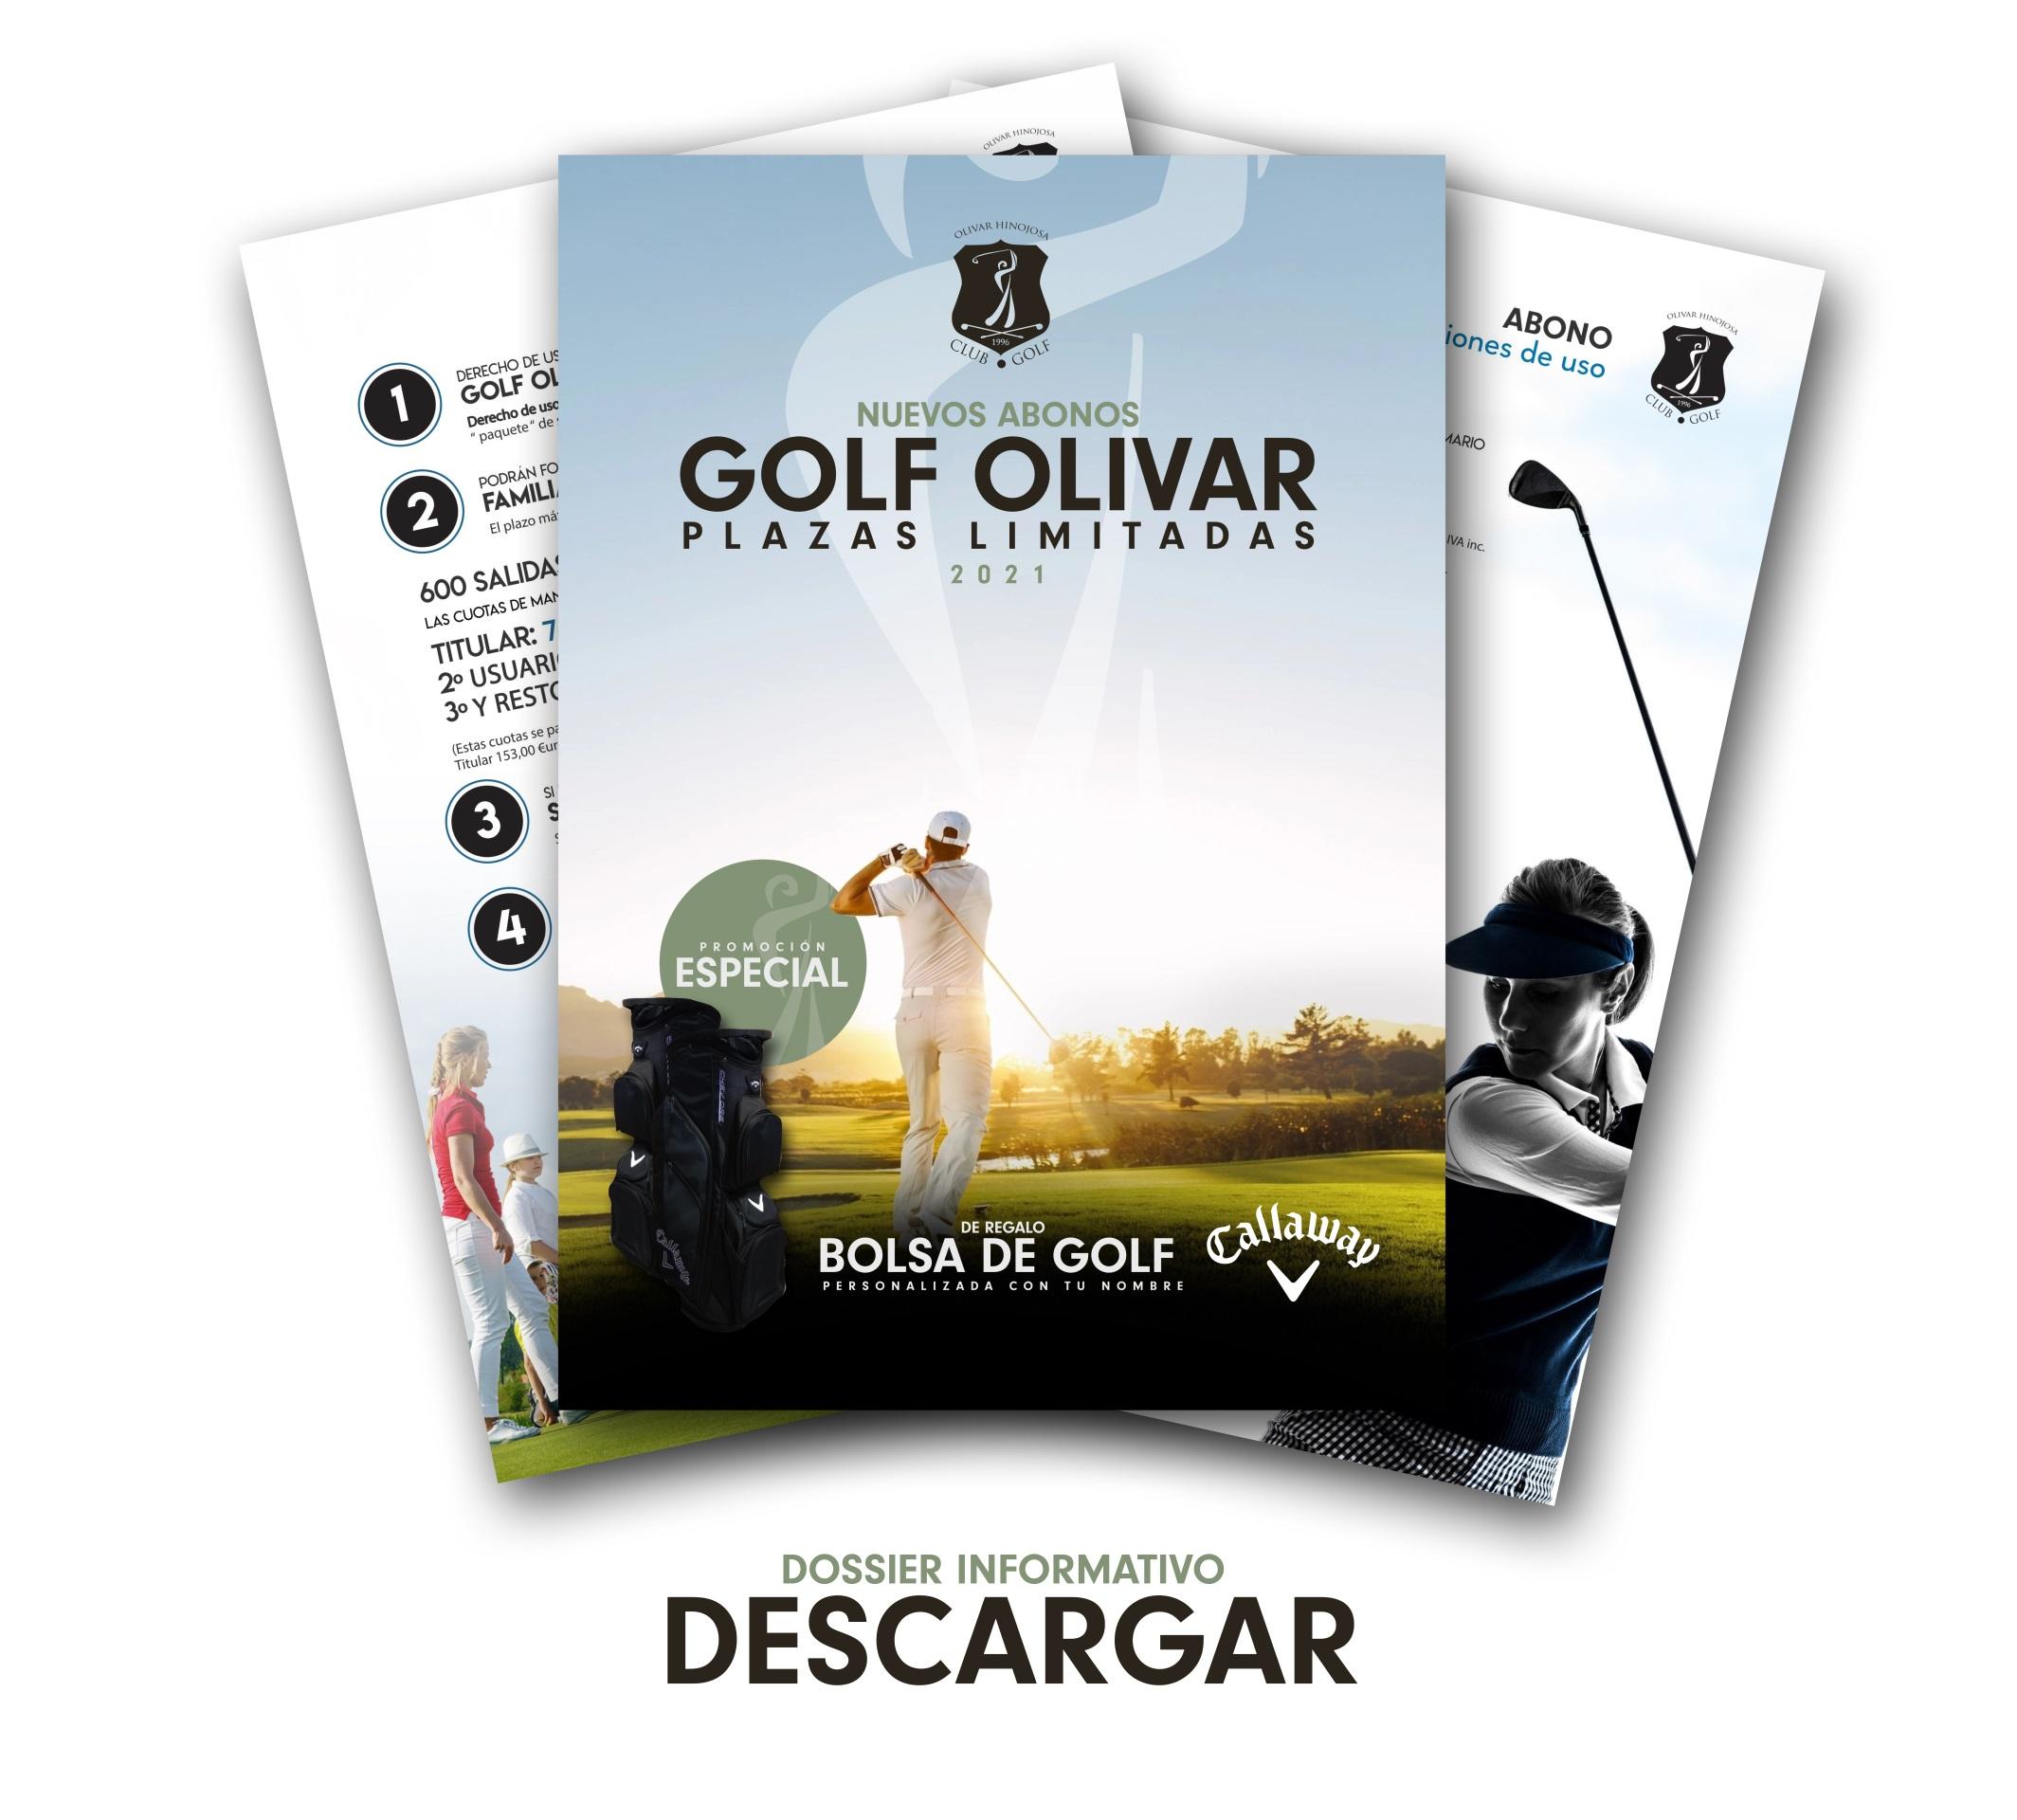 Golf Olivar Abonos banner 2021 Joaquin Molpeceres Sanchez